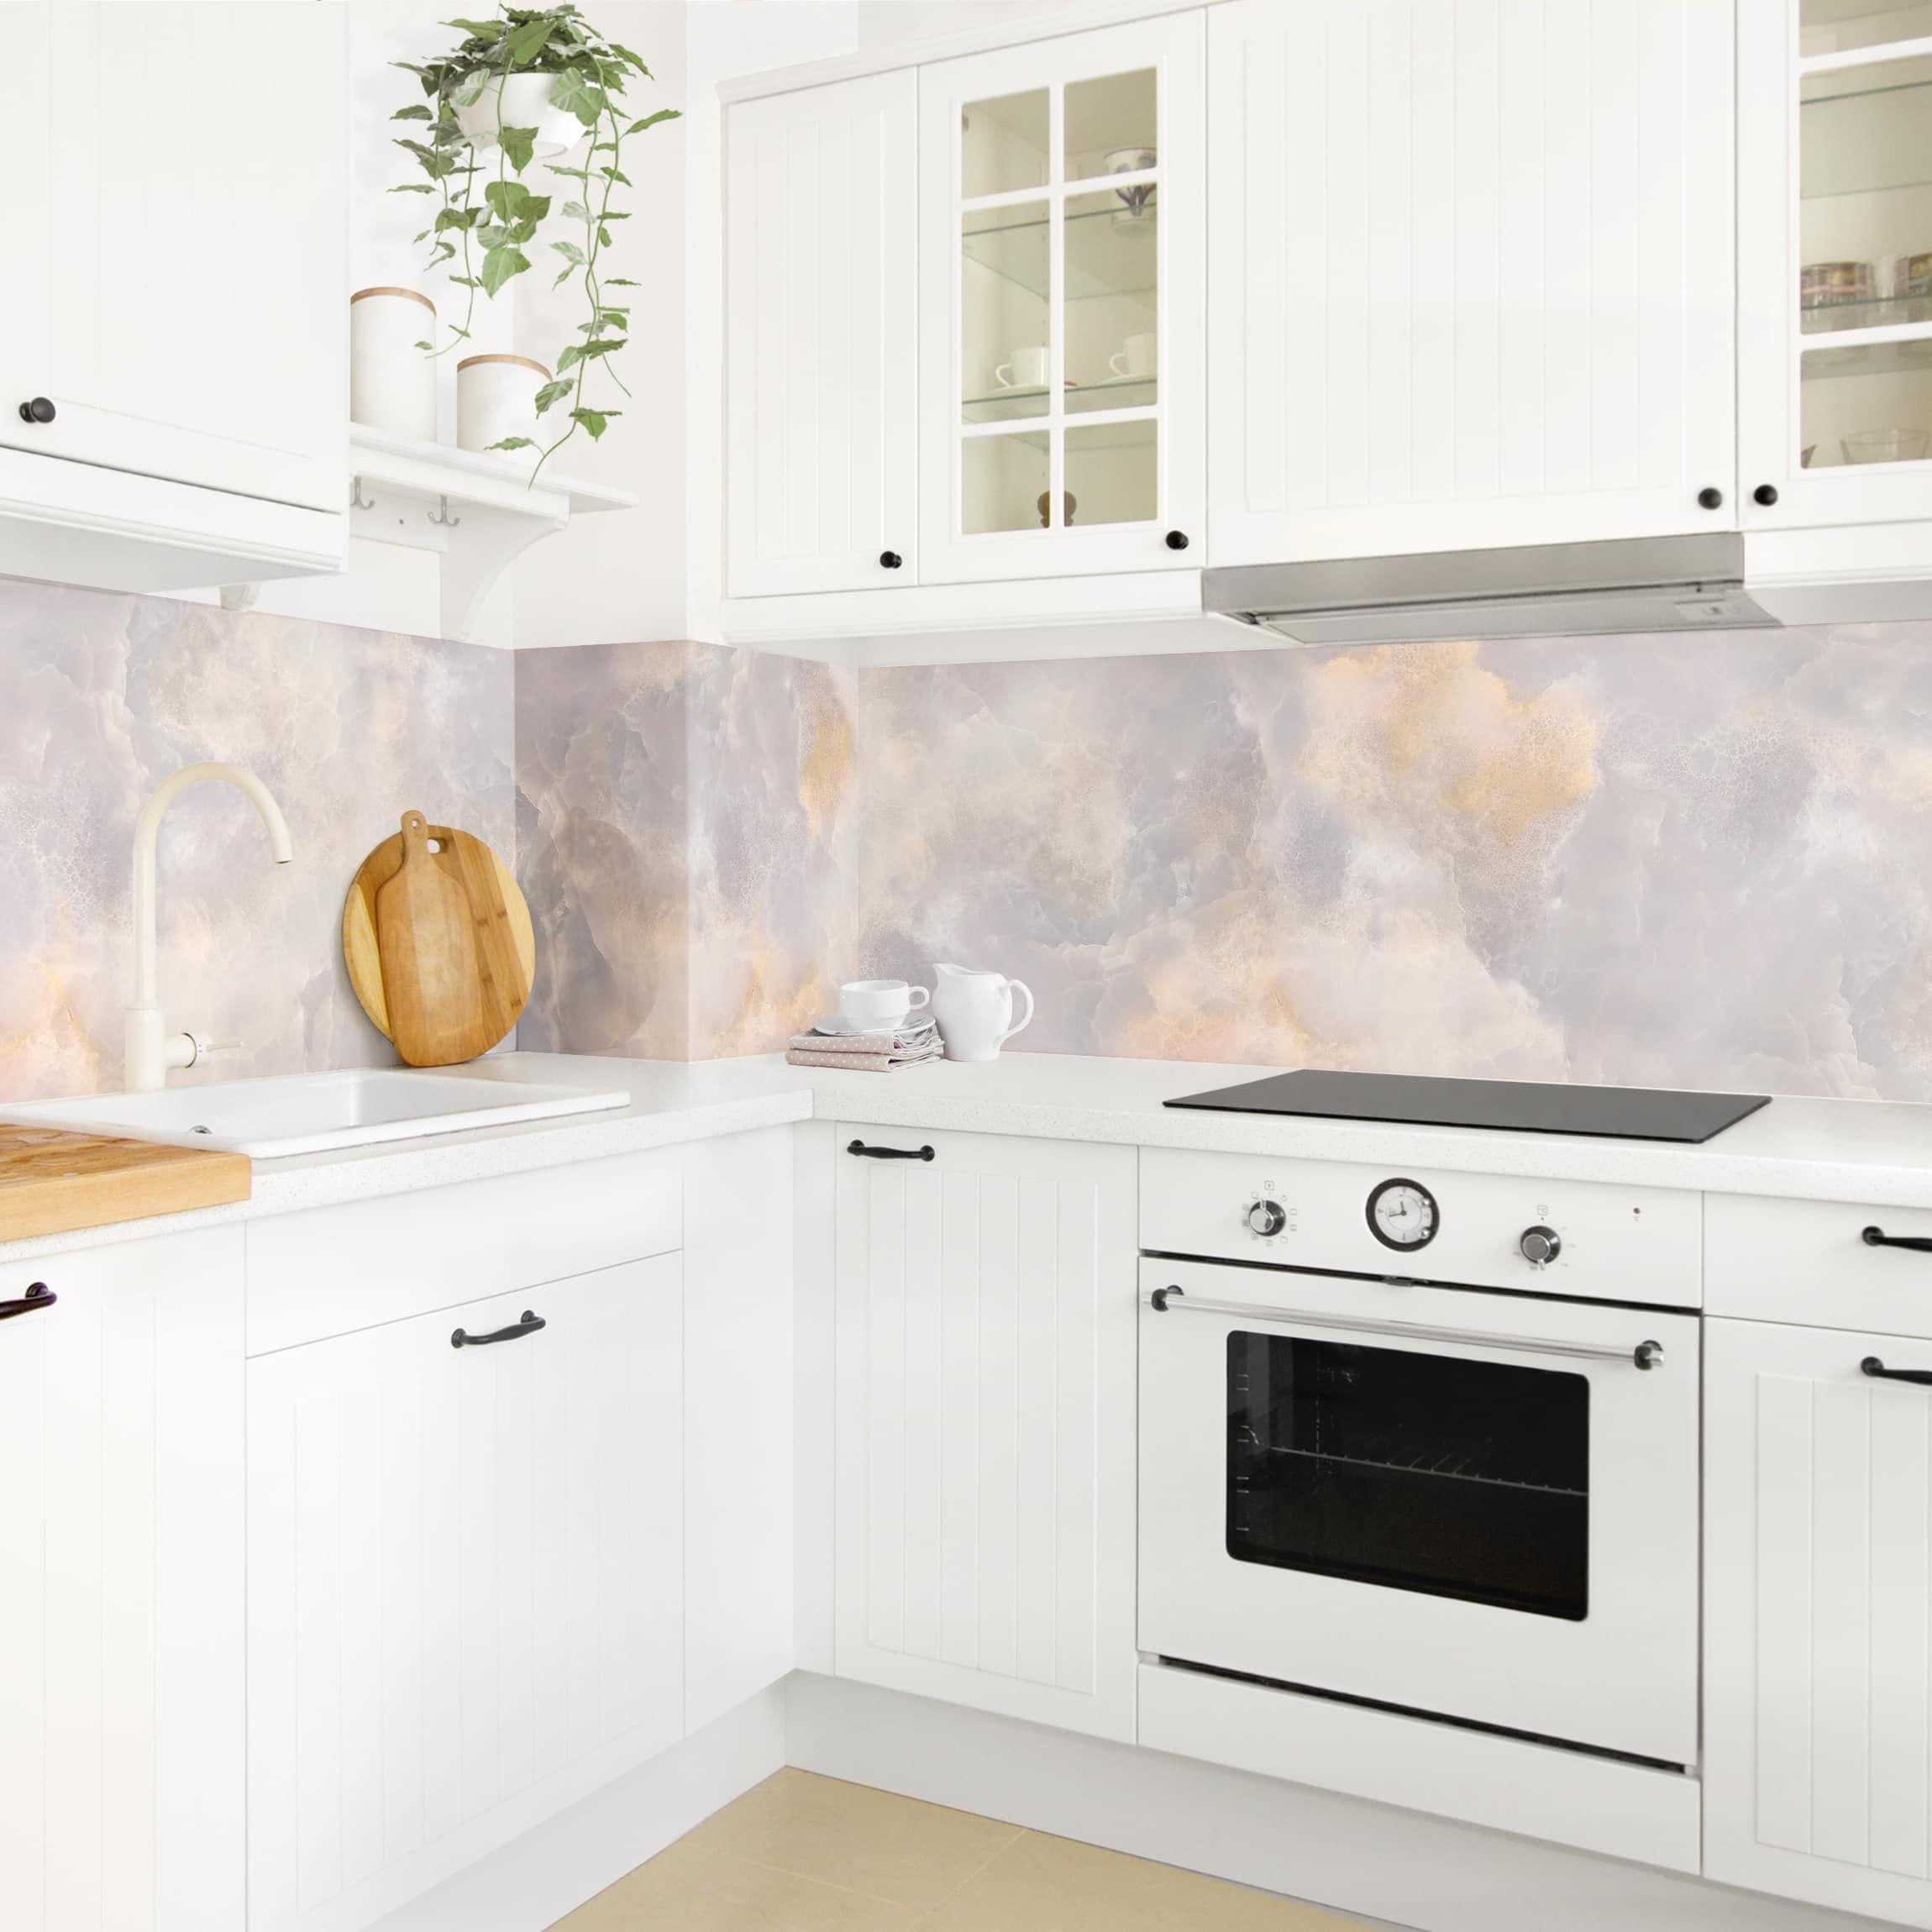 Rivestimento cucina - Marmo Onyx grigio | Piastrelle, Cucine ...